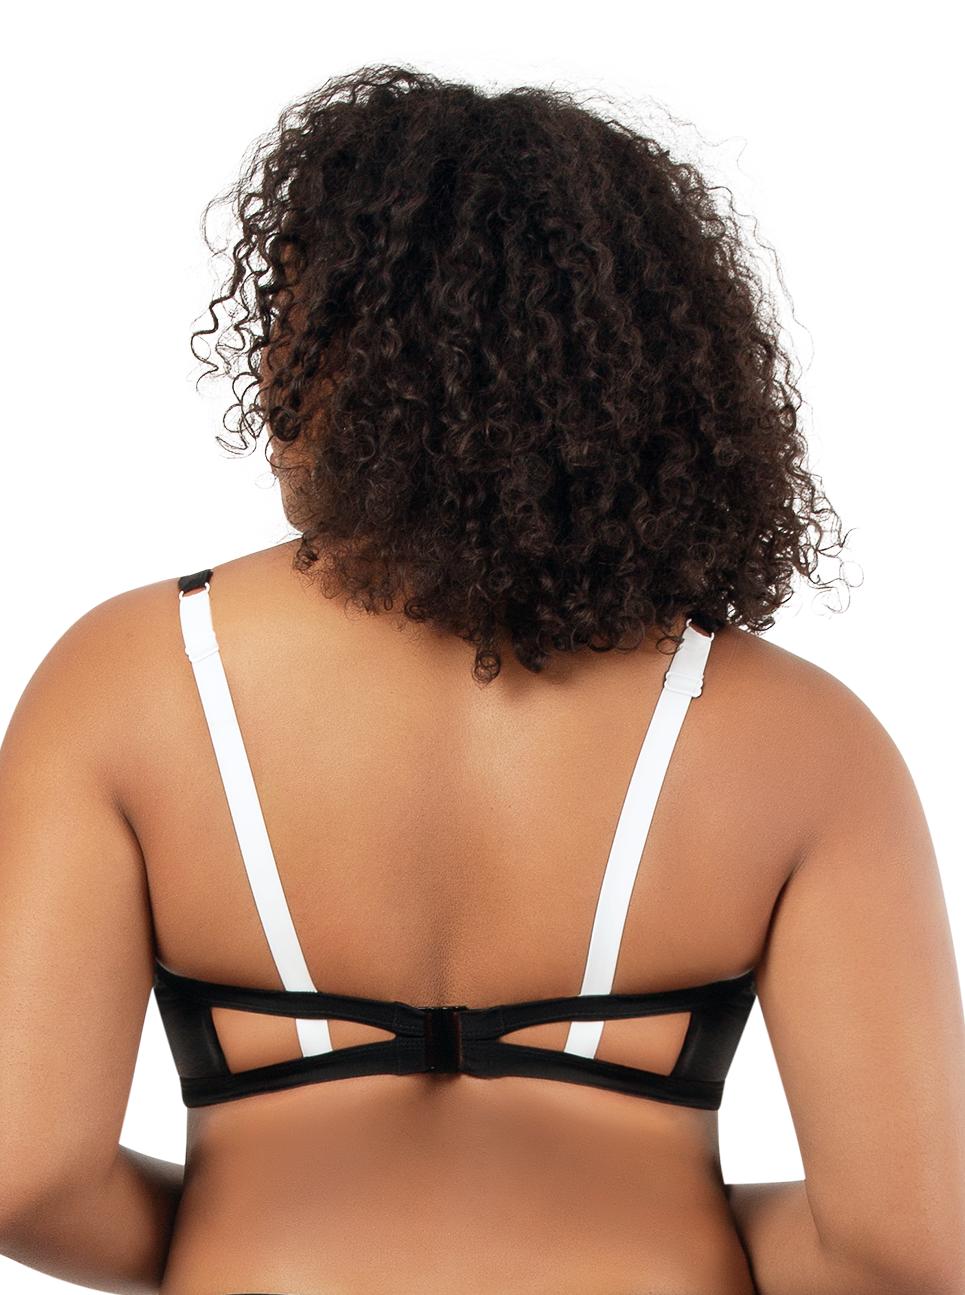 PARFAIT Lauren TriangleSwimTopS8222 BlackWWhite Back - Lauren Triangle Swim Top Black w White S8222